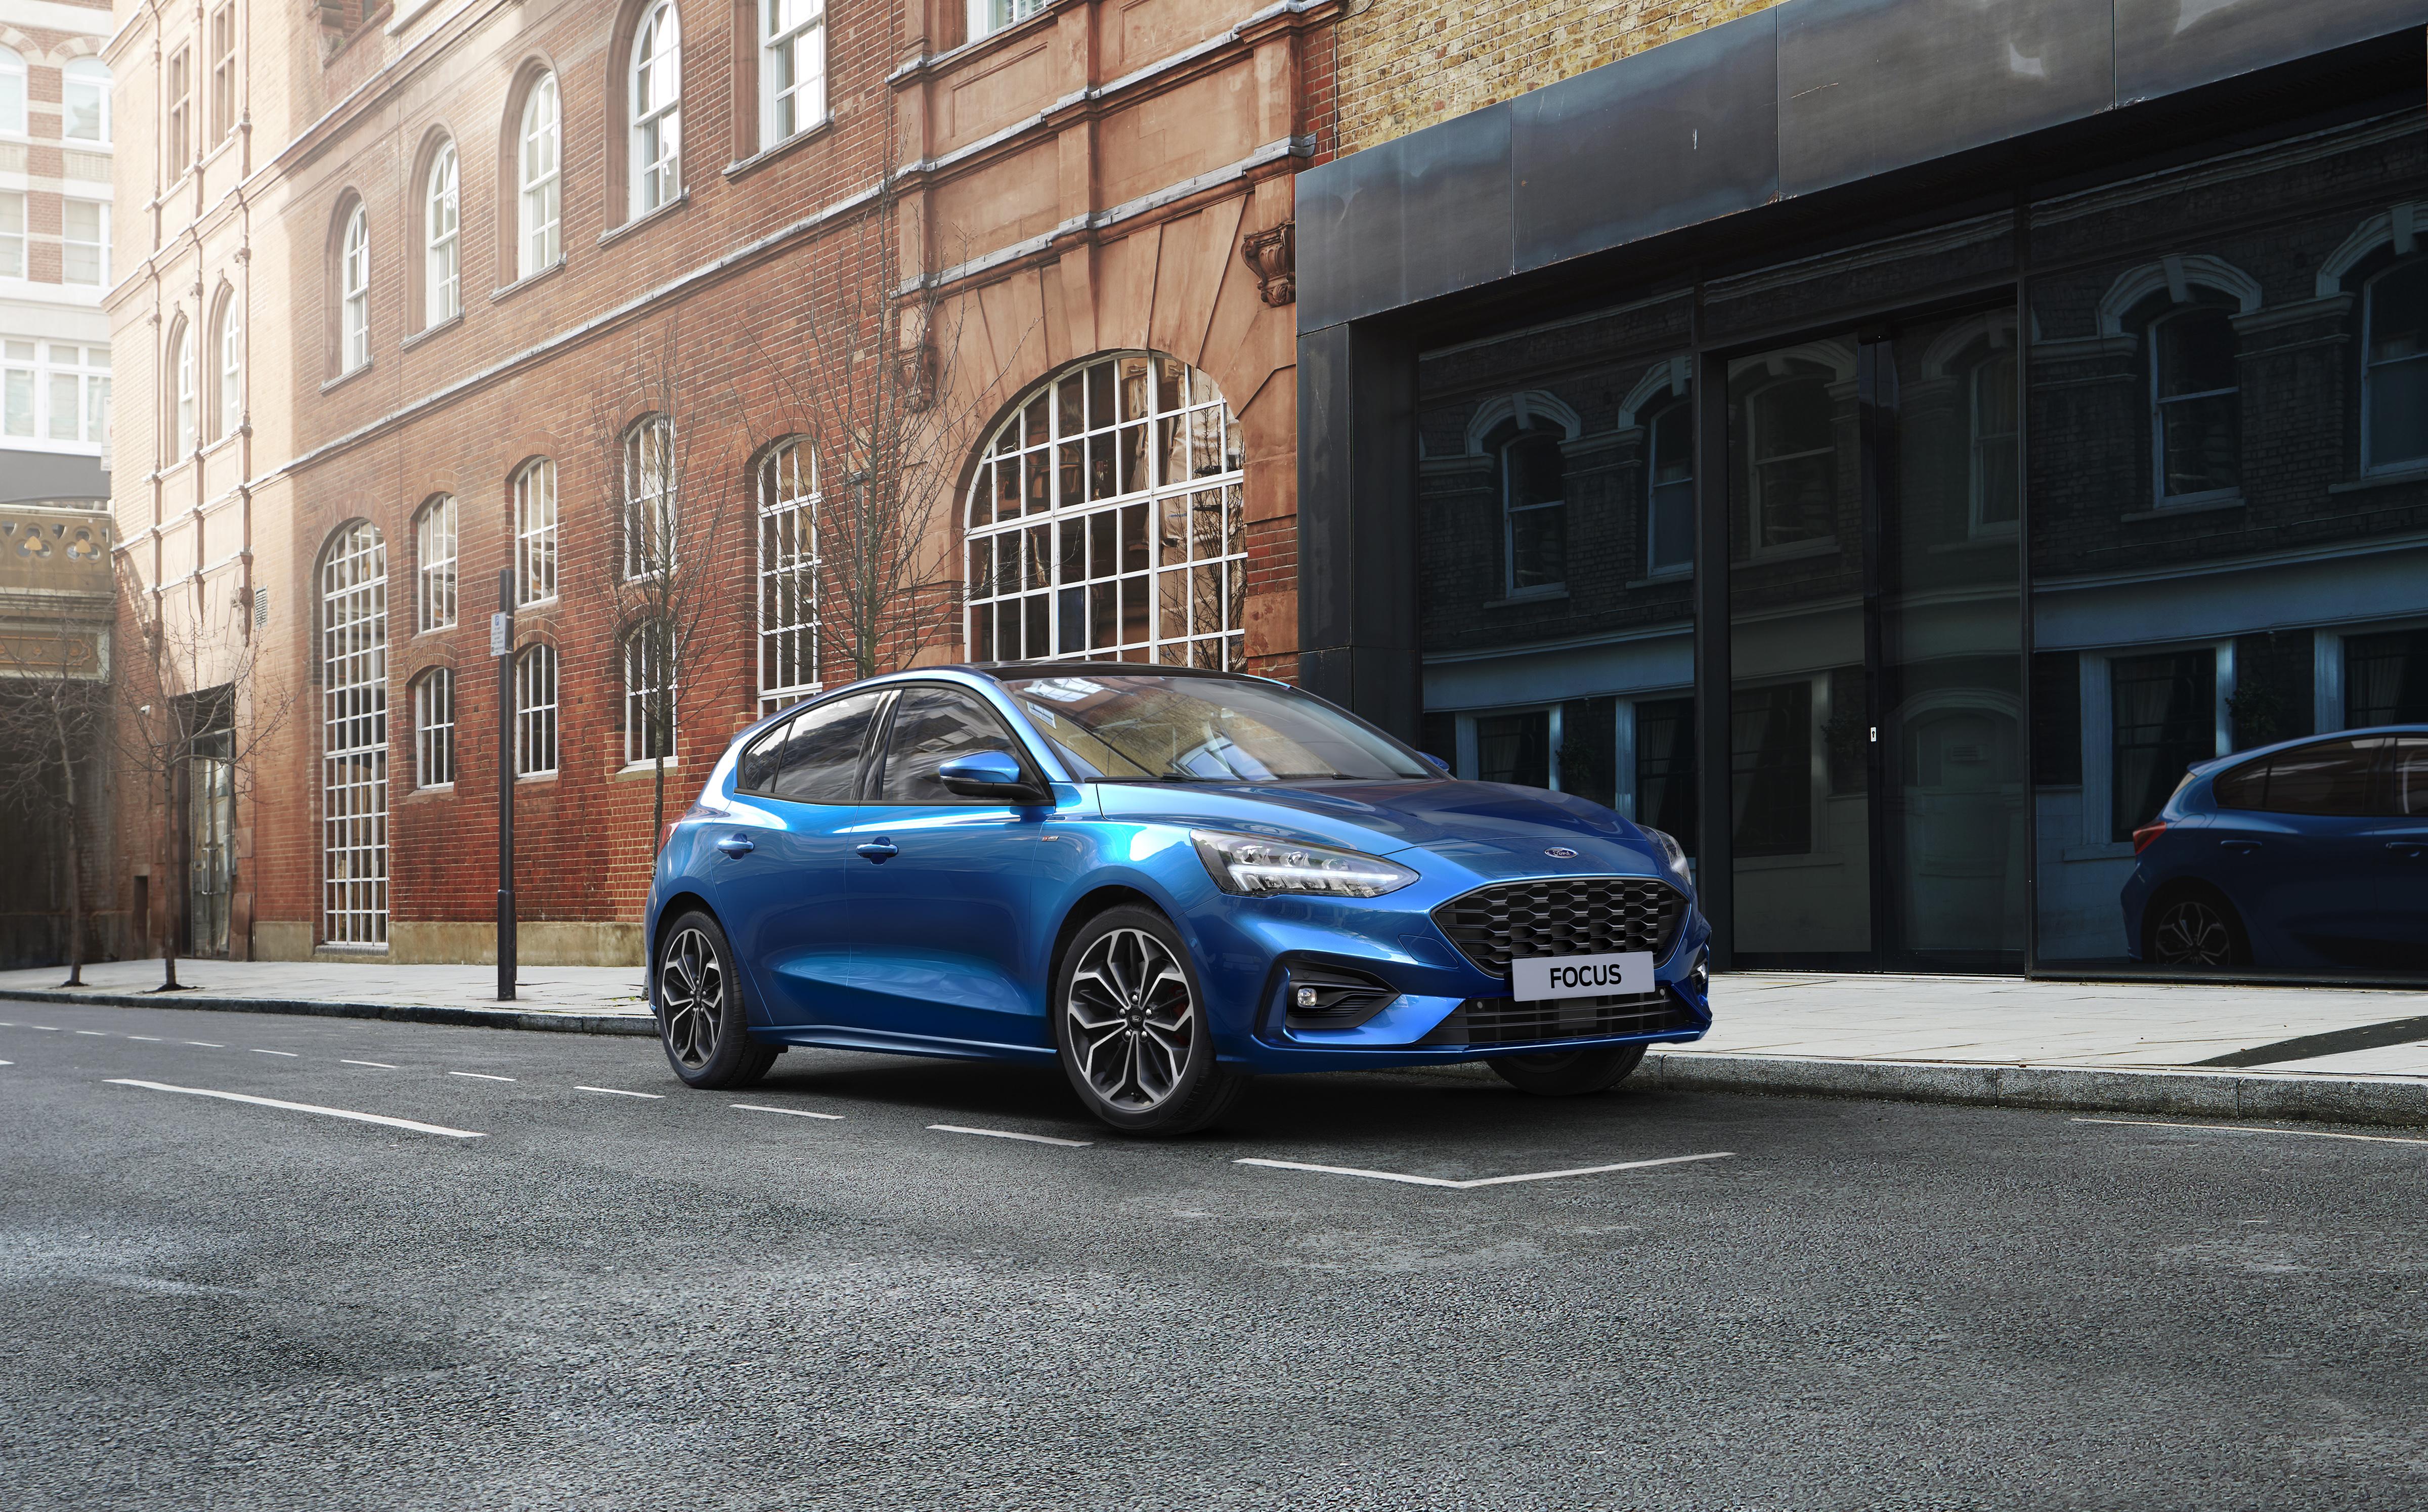 Ford Focus EcoBoost Mild Hybrid